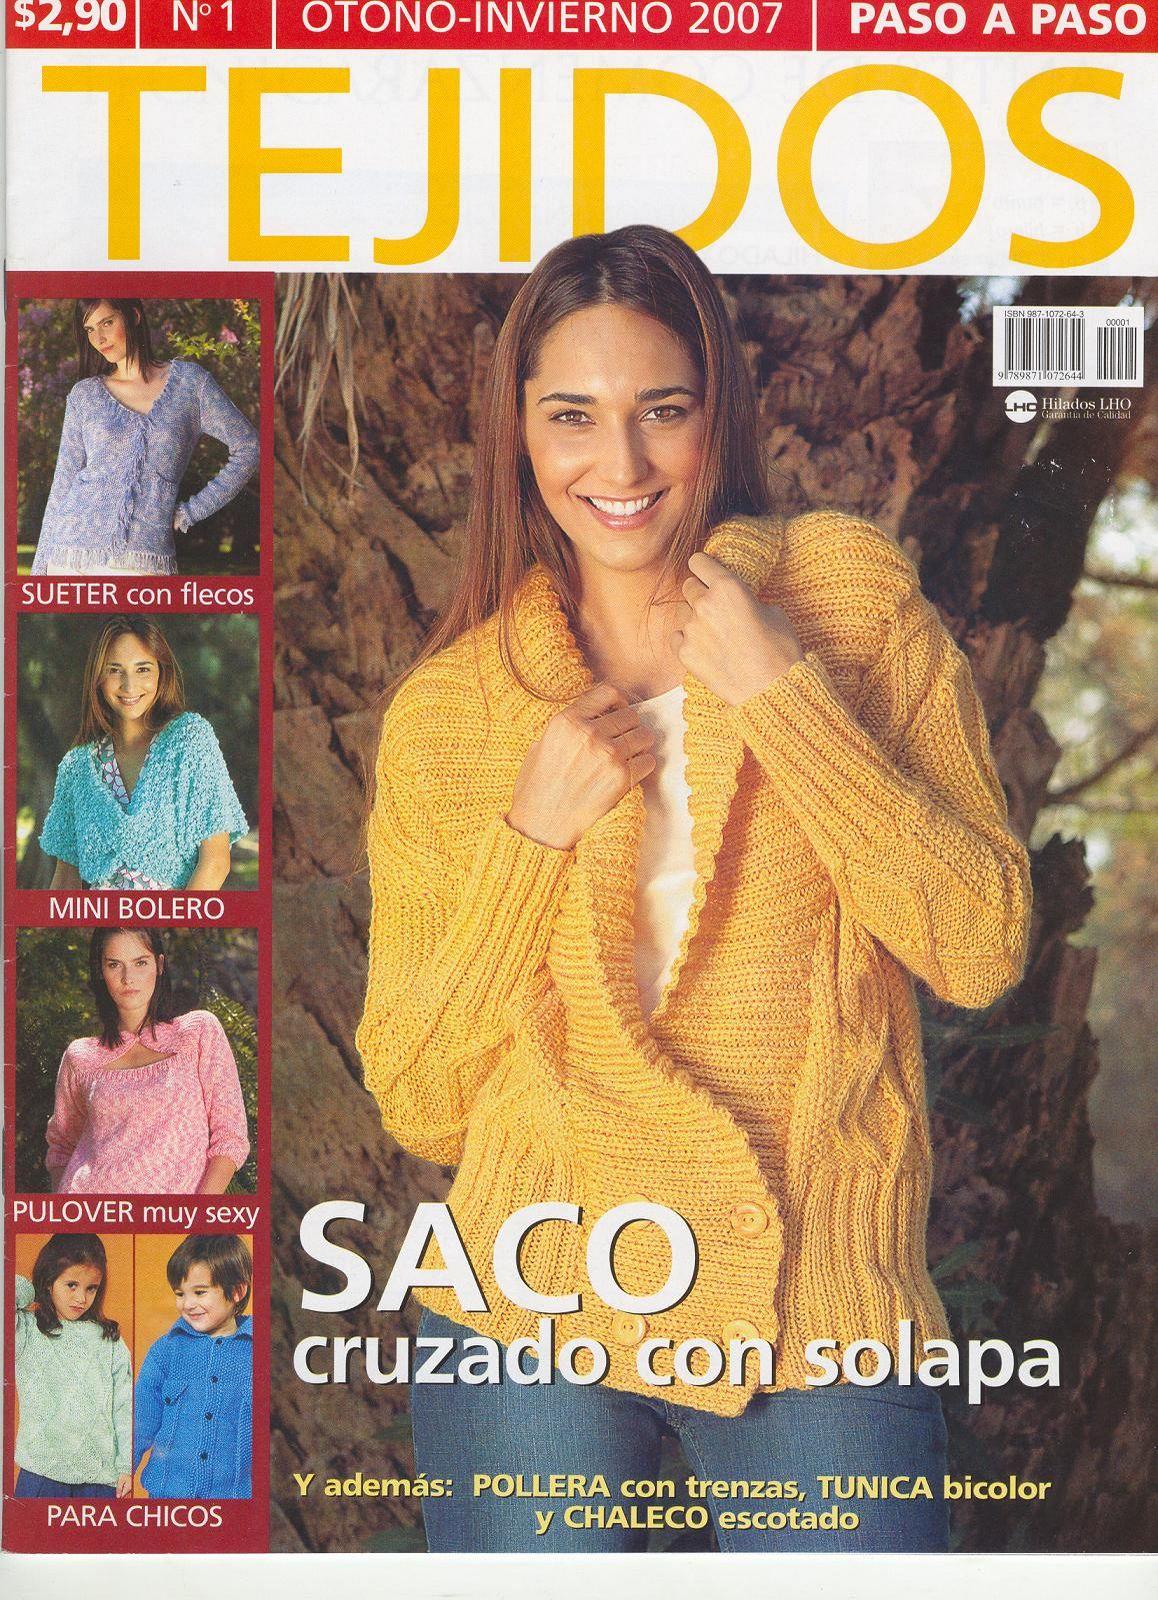 Revista: Tejido Paso a Paso 1 (en dos agujas)